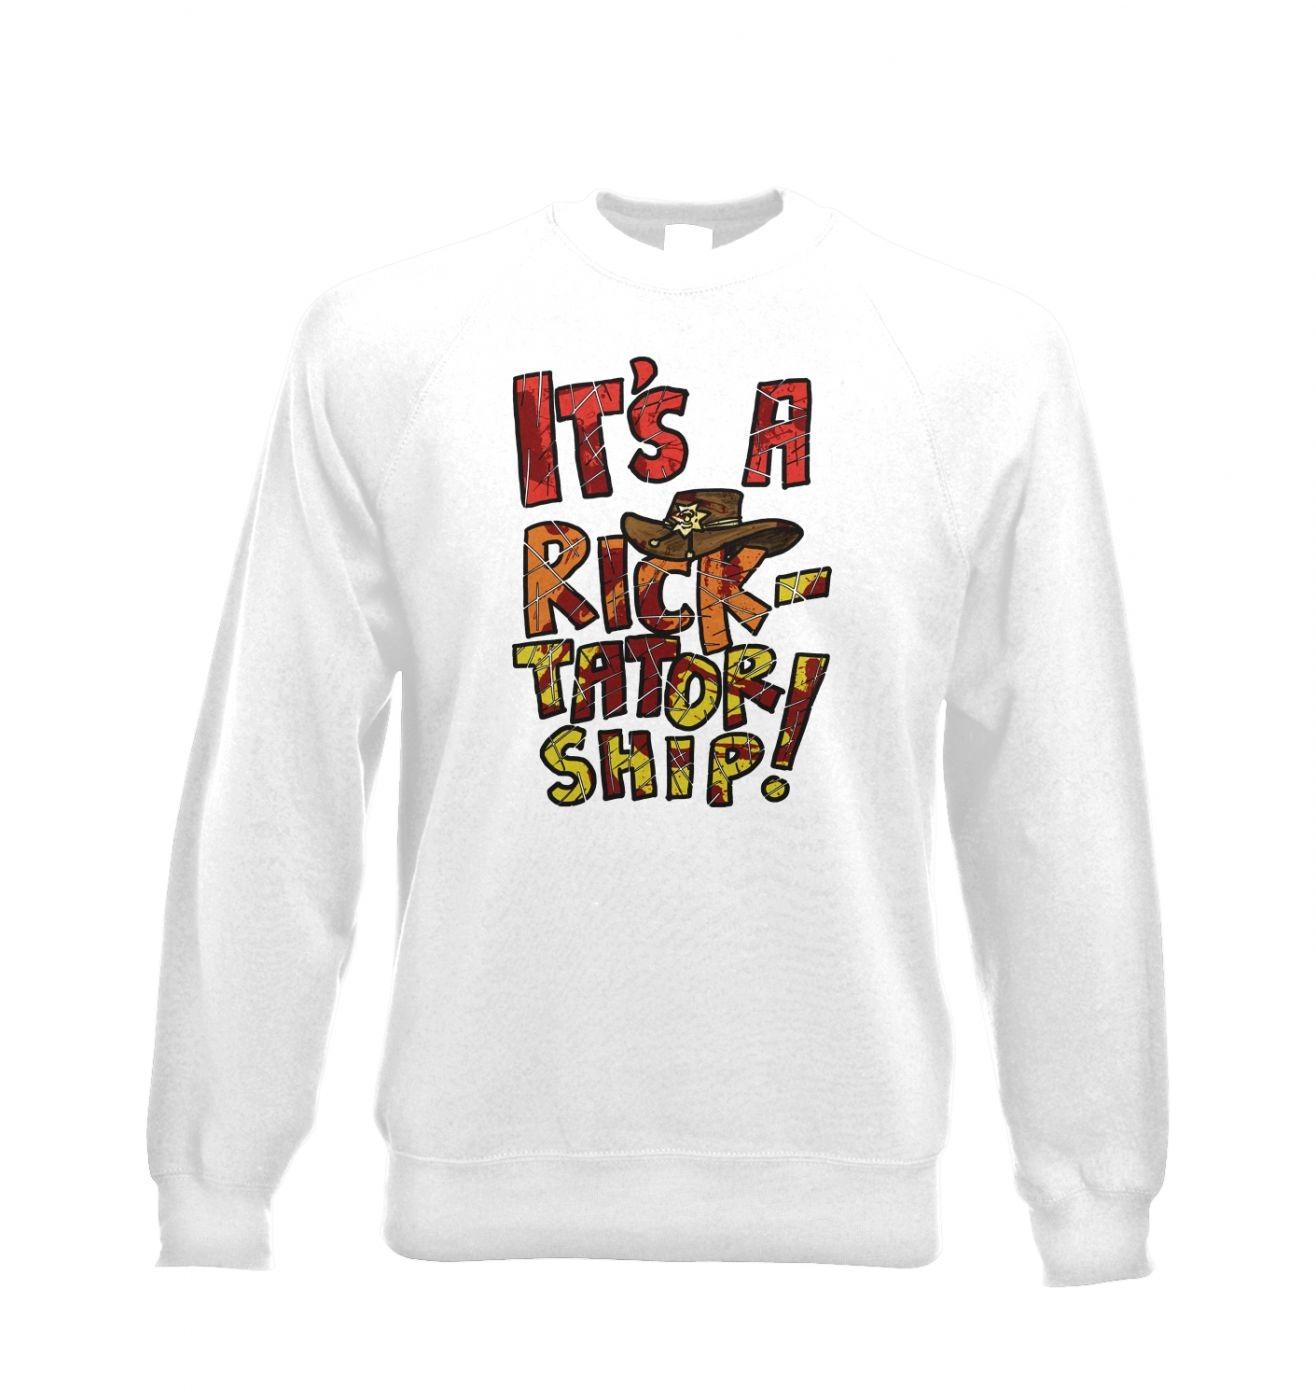 It's a Ricktatorship unisex crewneck sweatshirt